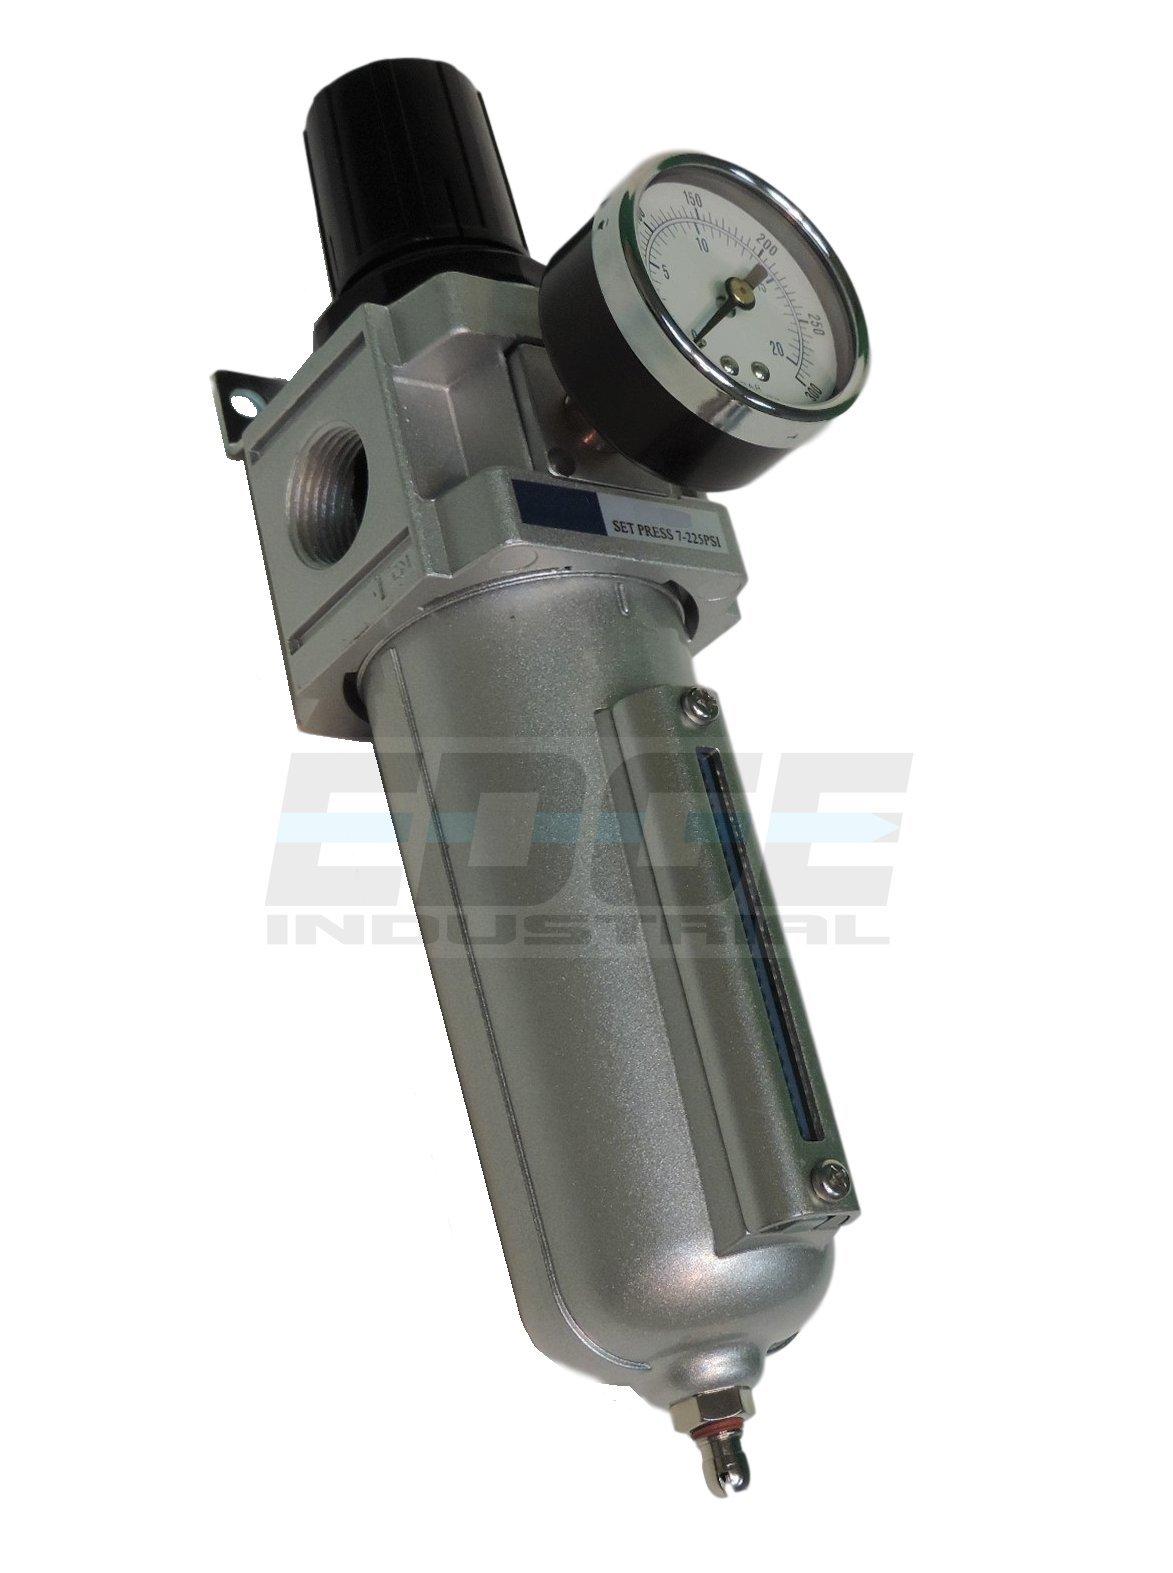 HEAVY DUTY COMPRESSED AIR FILTER REGULATOR COMBO PIGGYBACK, METAL BOWL, 3/4'' NPT PORTS, 140 CFM, VISIBLE SIGHT GLASS, 5 MICRON ELEMENT